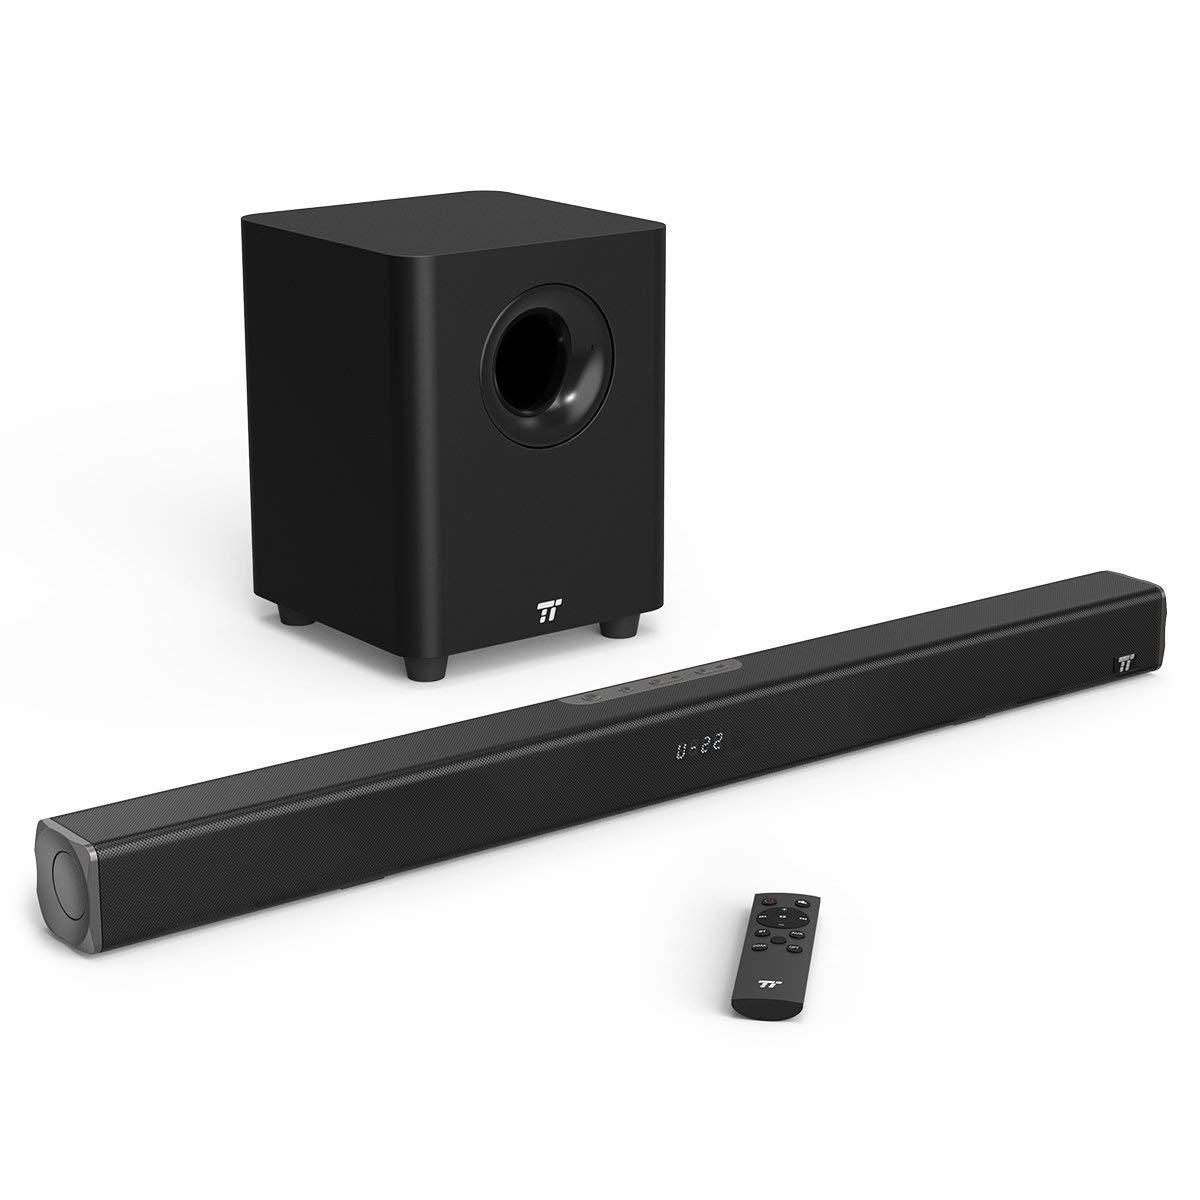 Bluetoothシャワースピーカー(鮮明なサウンド、ハンズフリー通話用内蔵マイク、ソリッド吸盤、6時間再生、コントロールボタン)   B07PFDSQY4